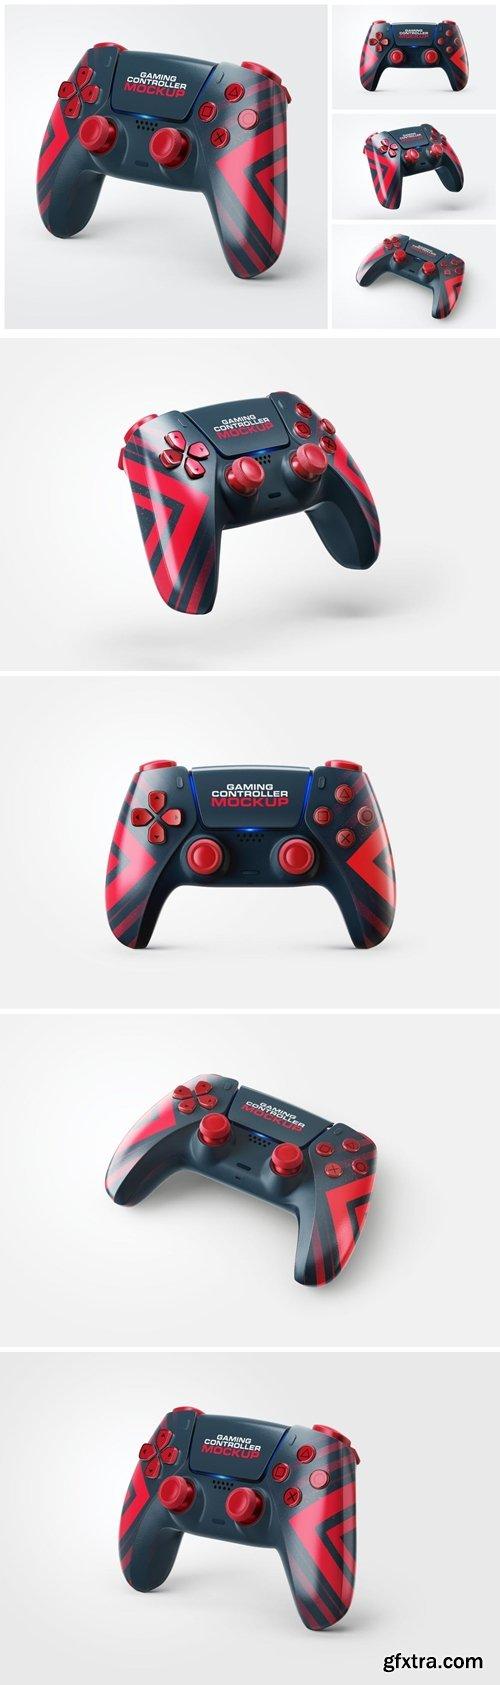 PS5 Controller Mockup Set